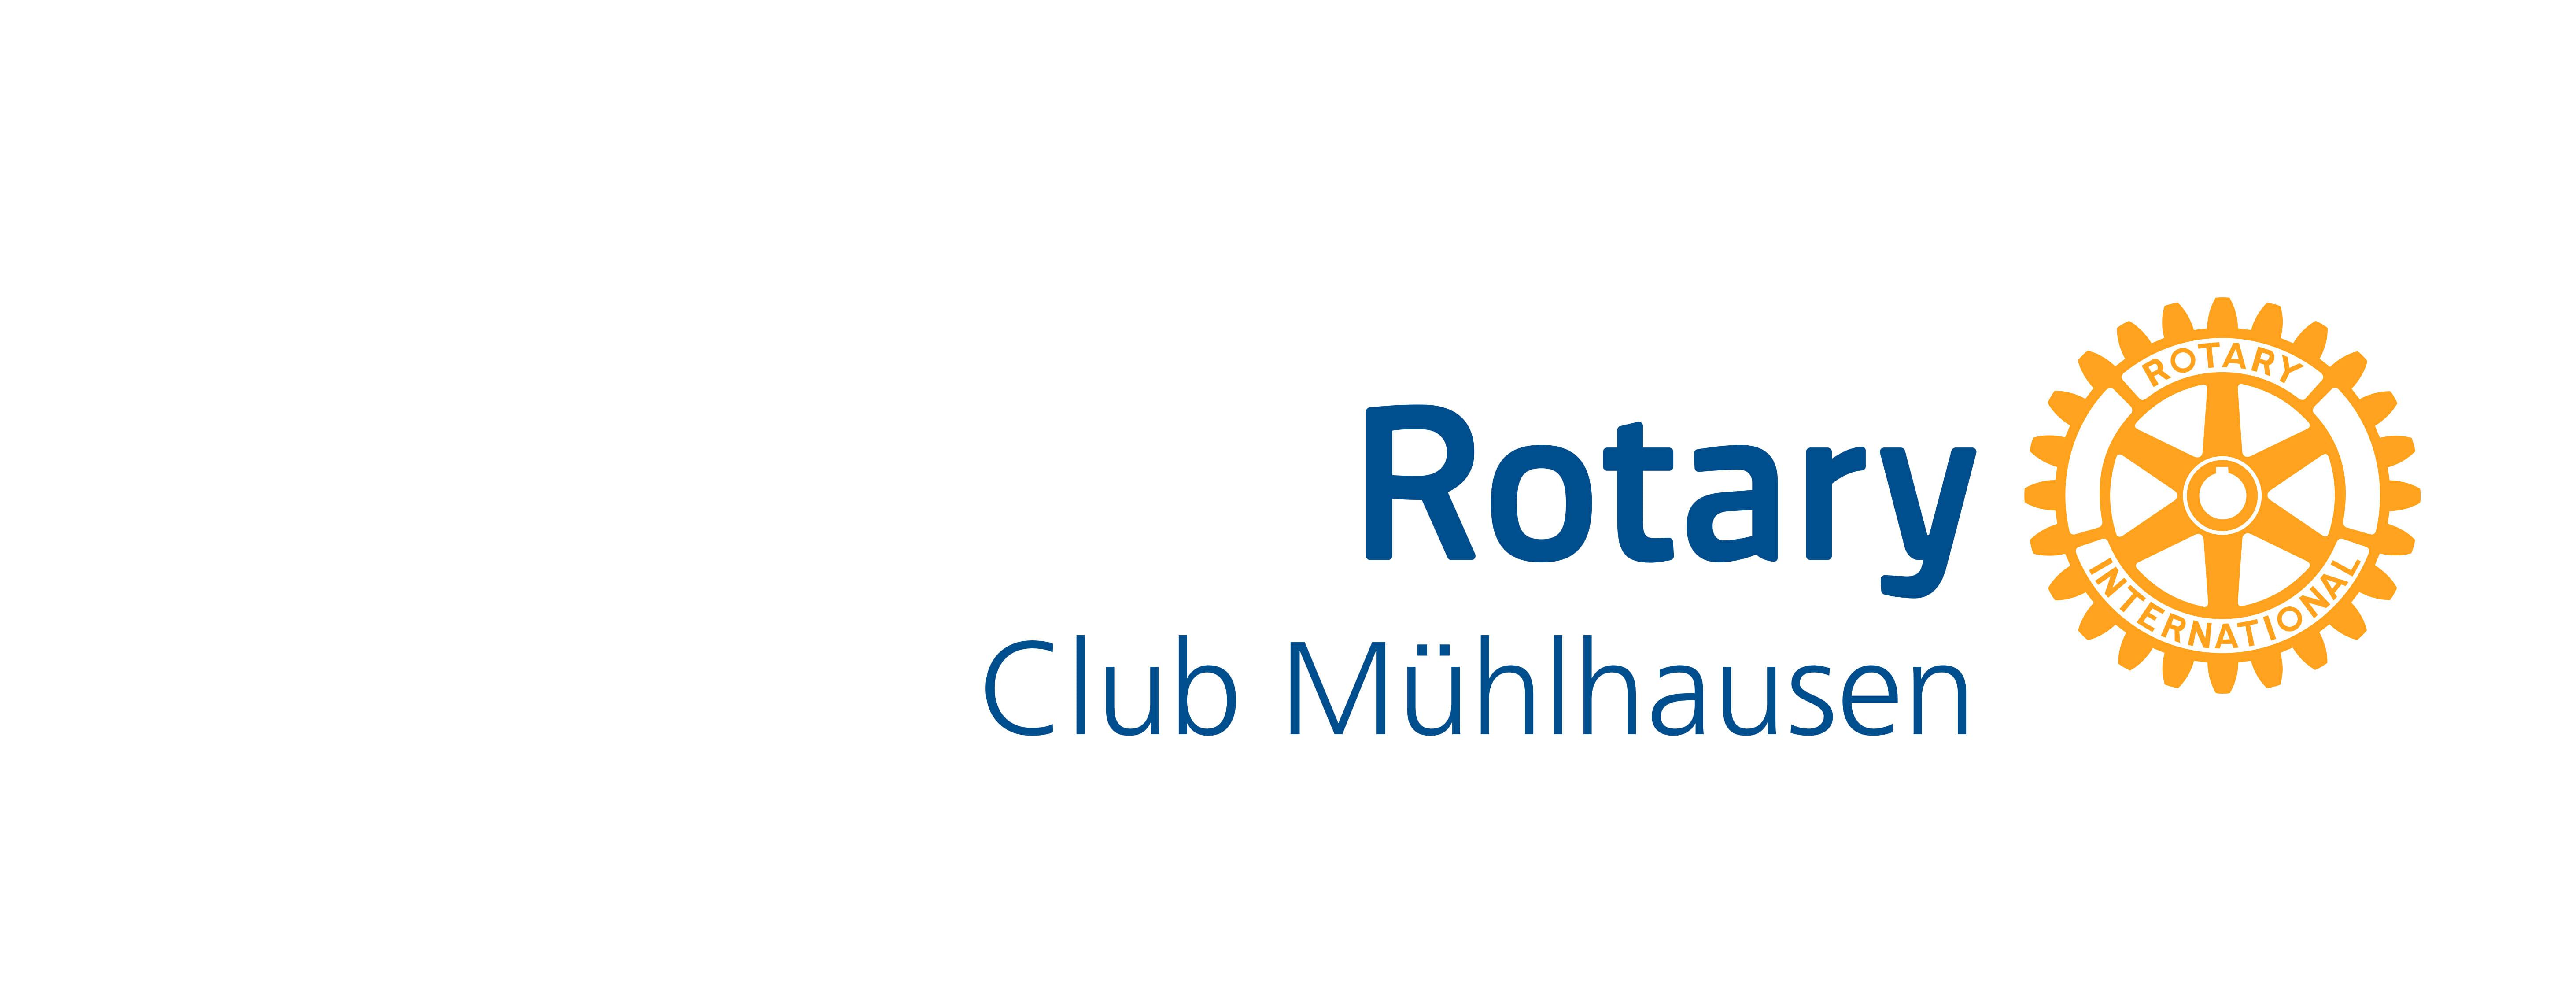 Rotary Club Mühlhausen